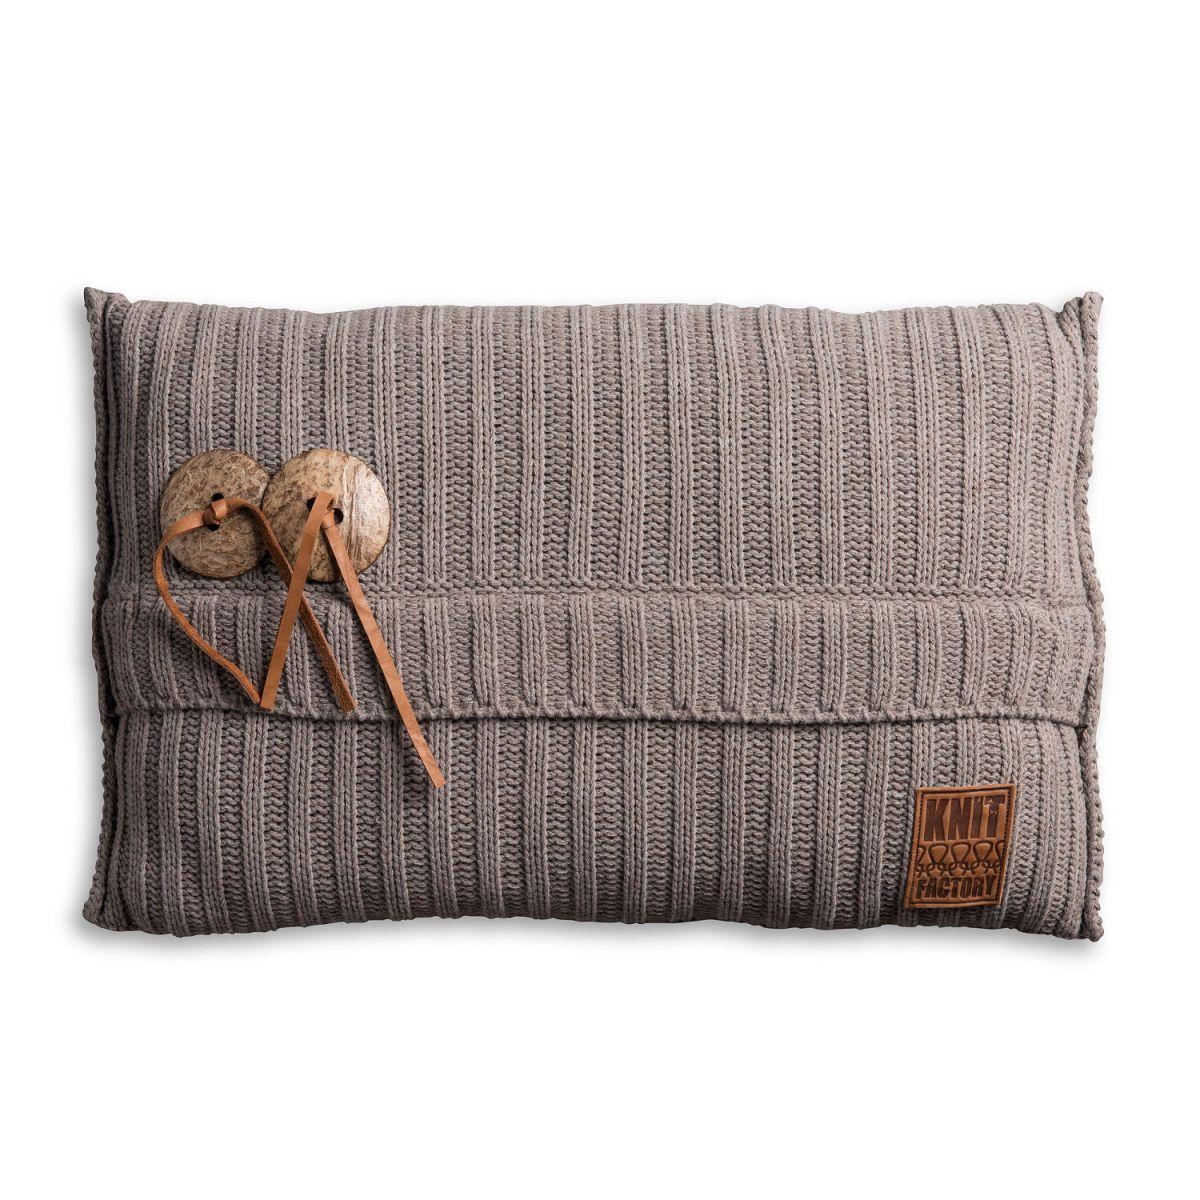 knit factory 1101329 kussen 60x40 aran taupe 1